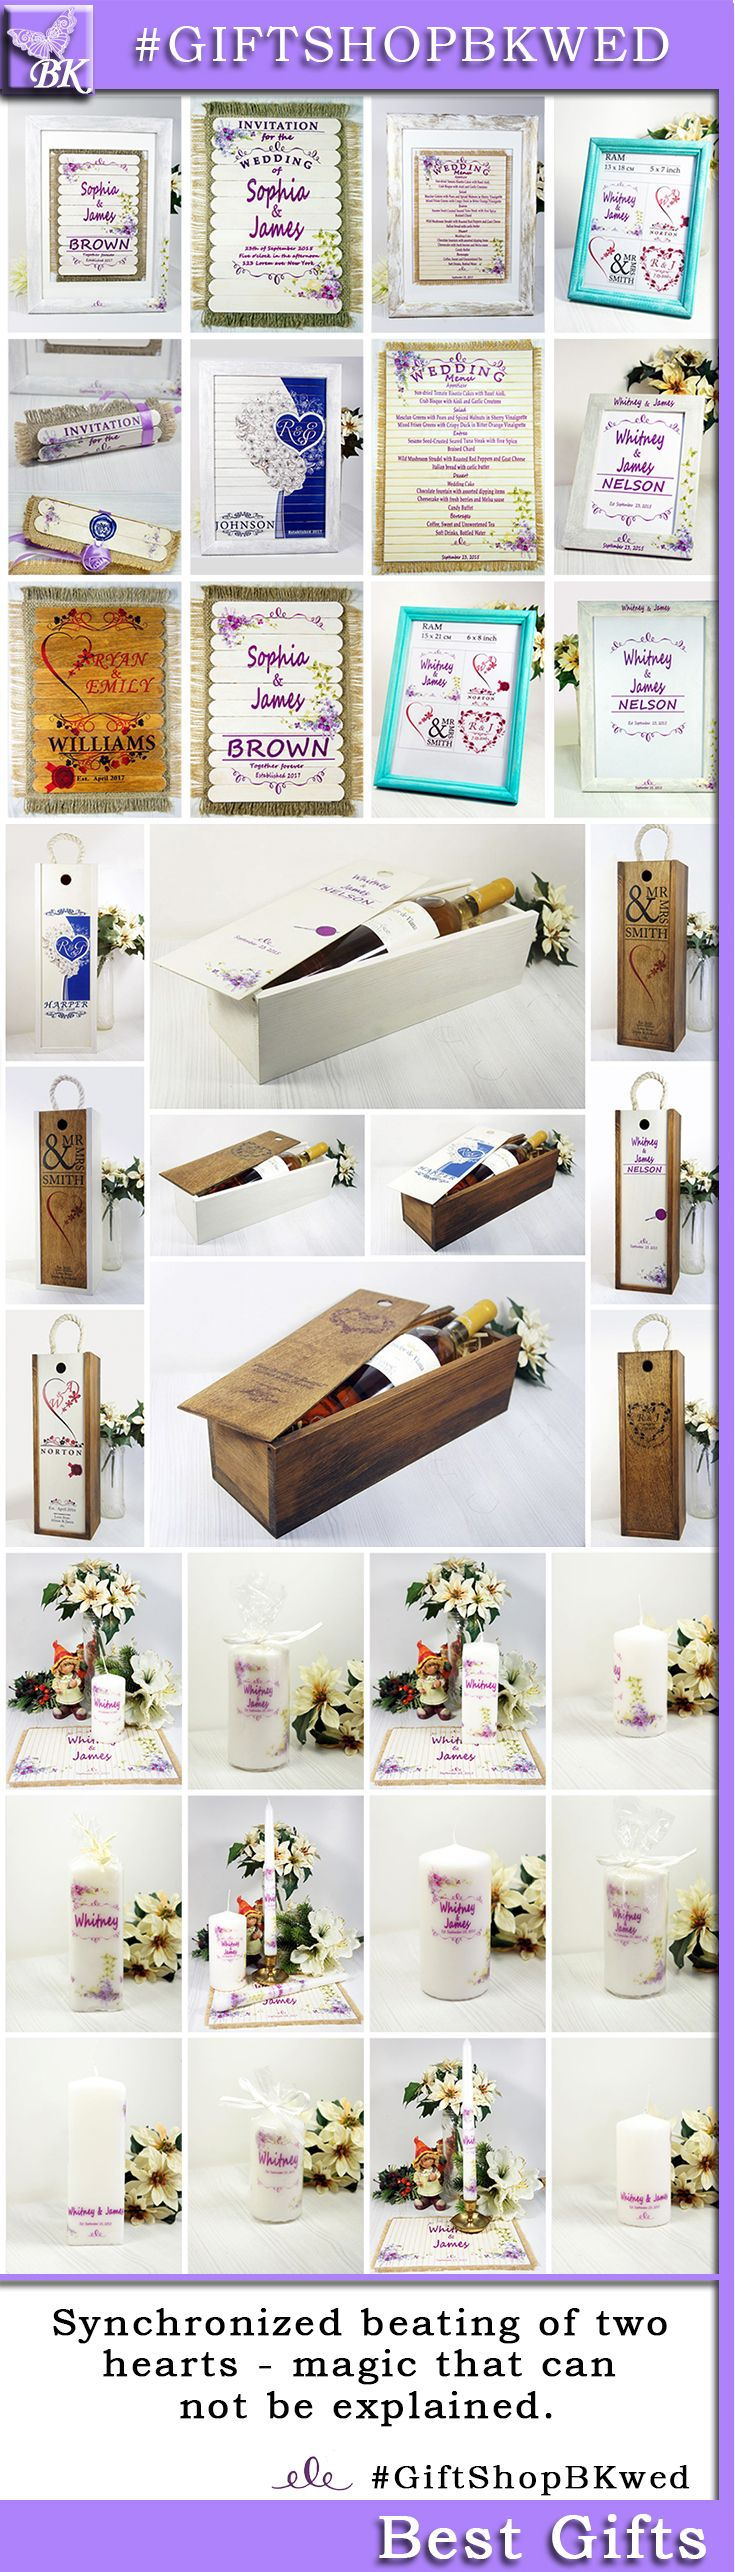 Personalized Wedding ceremony custom rustic wooden favor love Shabby Chic Bride Groom His Her mr mrs #giftshopbkwed #wedding #photo #ceremony #personalized #gift #rustic #Bride #Groom #His #Her #mr #mrs #anniversary #custom #monogram #diy #shabbychic #favor #love #tree #decor #shabby #chic #home #ideas #nature #winebox  #birthday #housewarming #wood #wooden #wine #box #candle #frame